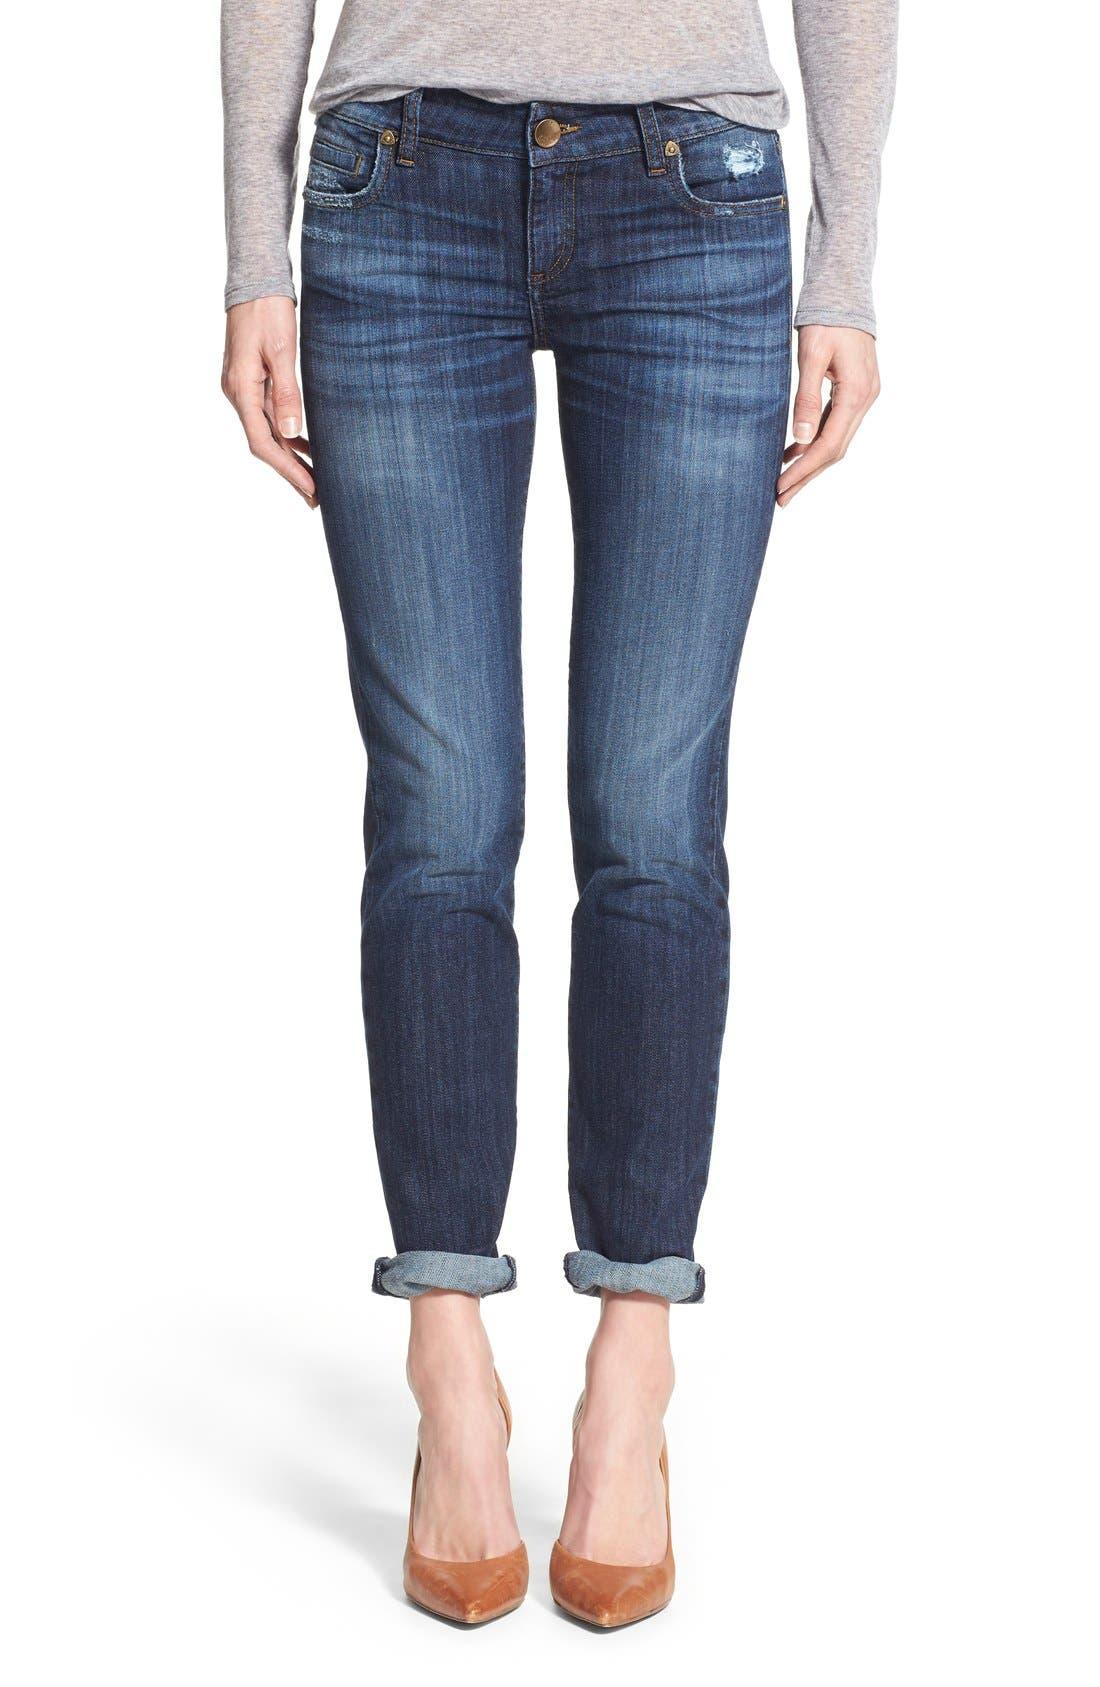 Main Image - KUT from the Kloth 'Catherine' Stretch Boyfriend Jeans (Goal) (Regular & Petite)